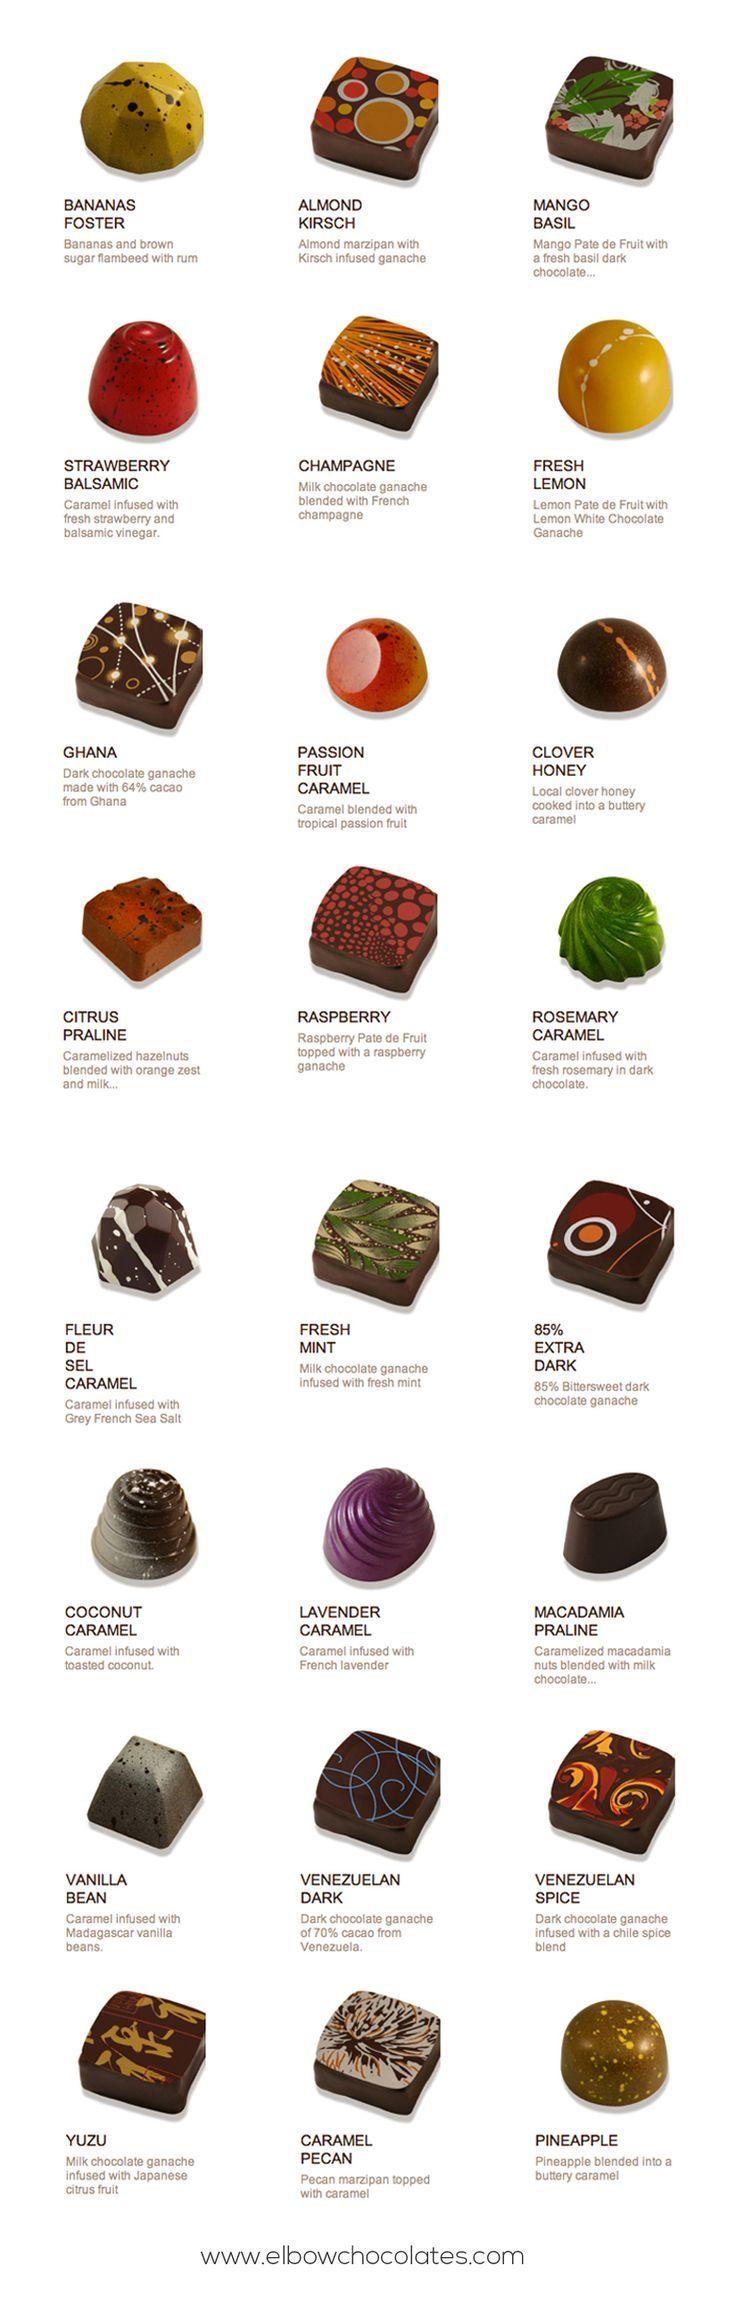 Christopher Elbow Chocolates-Haley likes Passionfruit Caramel, Venezuelan Dar Chocolate and Strawberry Balsalmic. I like Clover Honey too.: